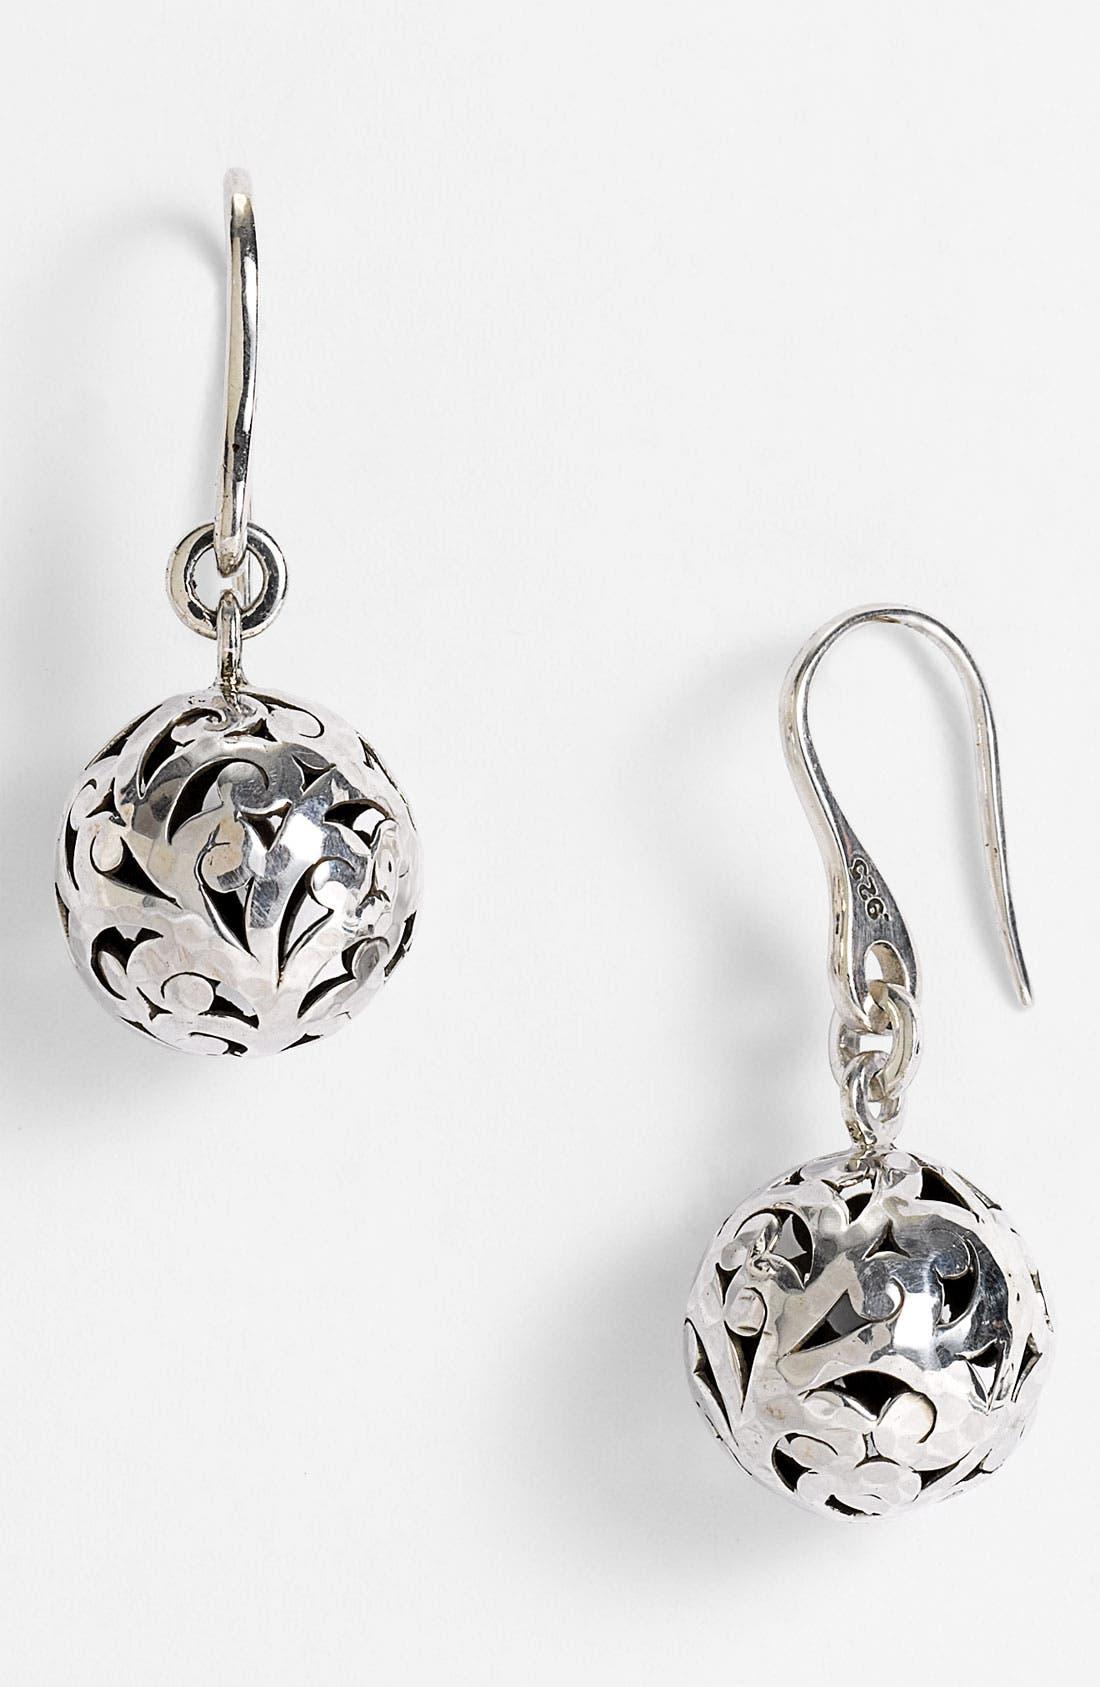 Main Image - Lois Hill 'Ball & Chain' Drop Earrings